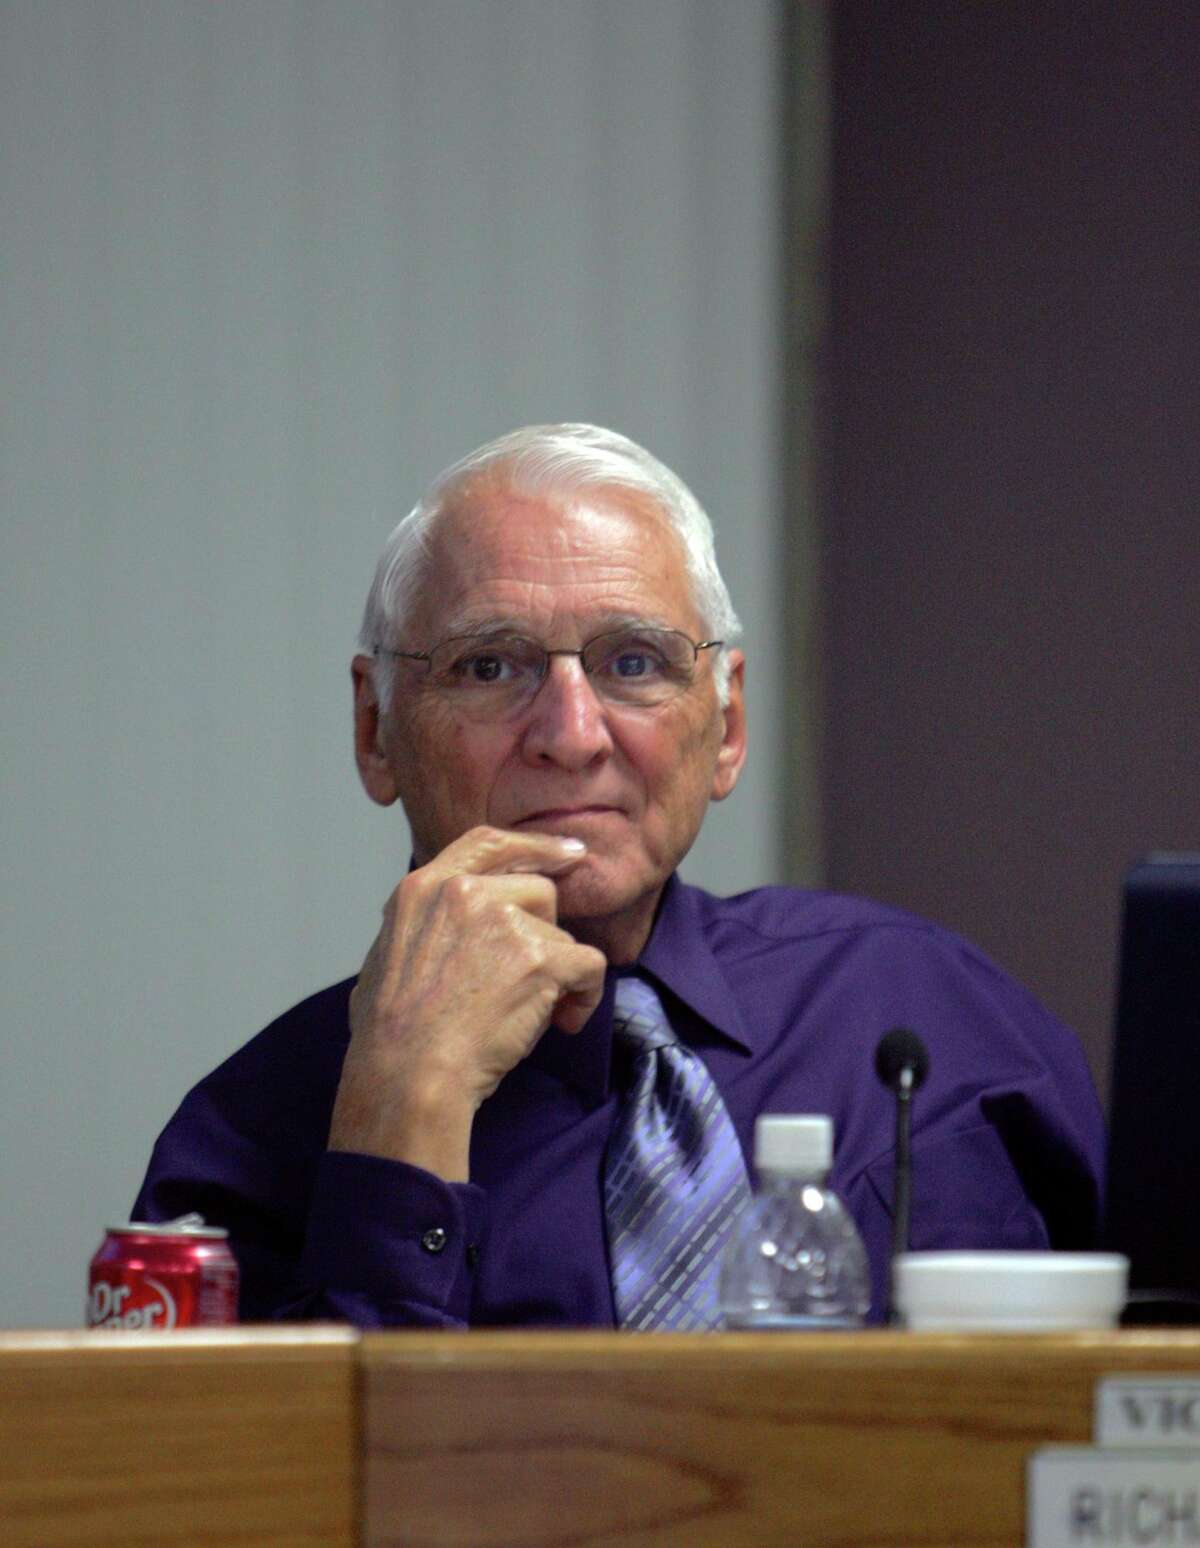 Judson school board member Richard Lafoille, in a 2007 file photo. BAHRAM MARK SOBHANI/STAFF